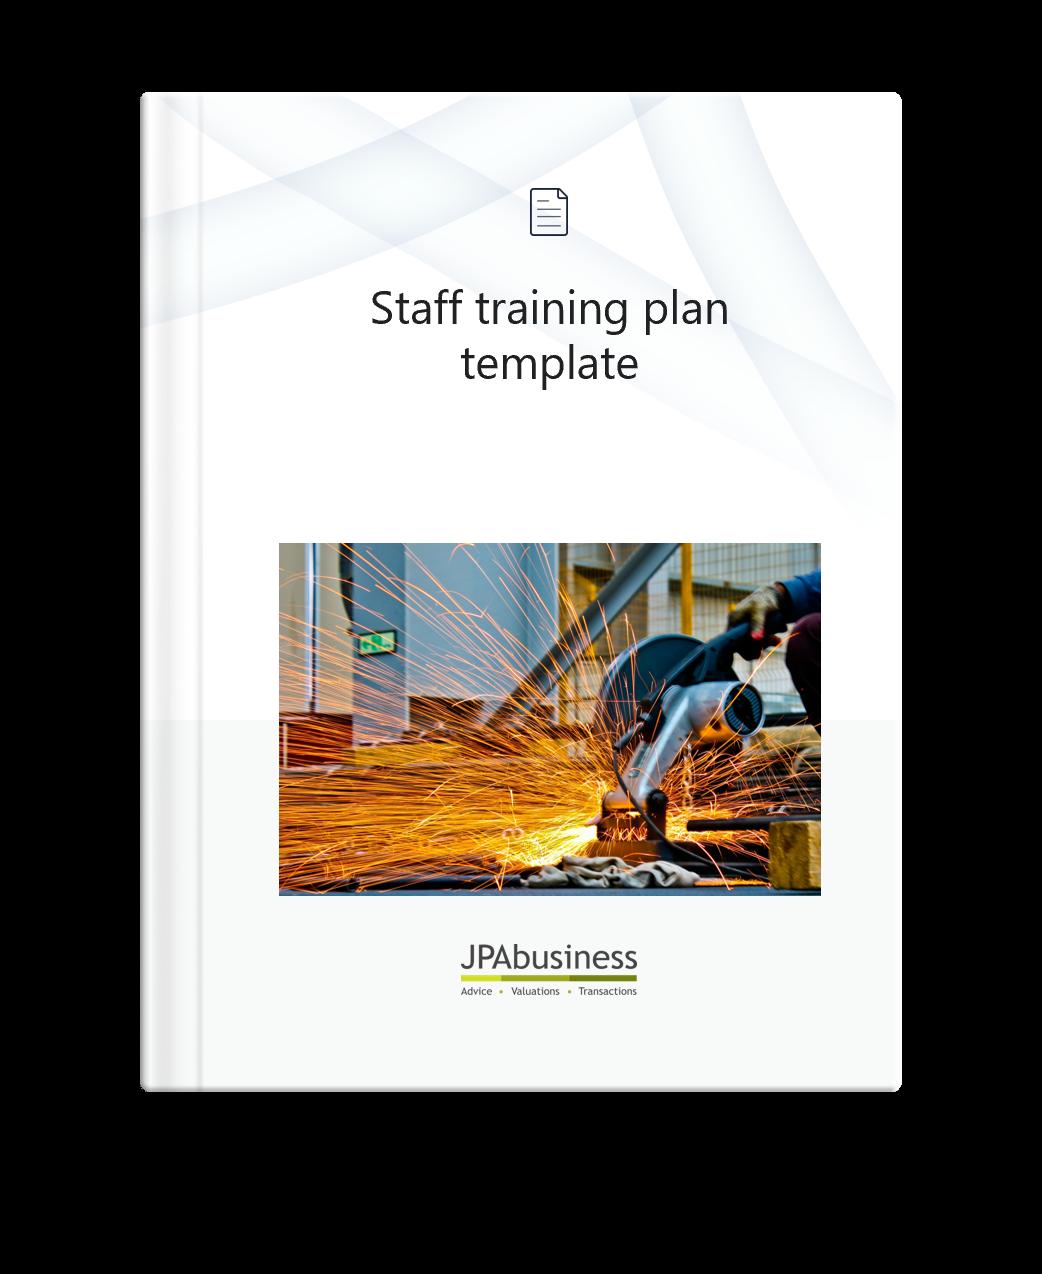 staff training template